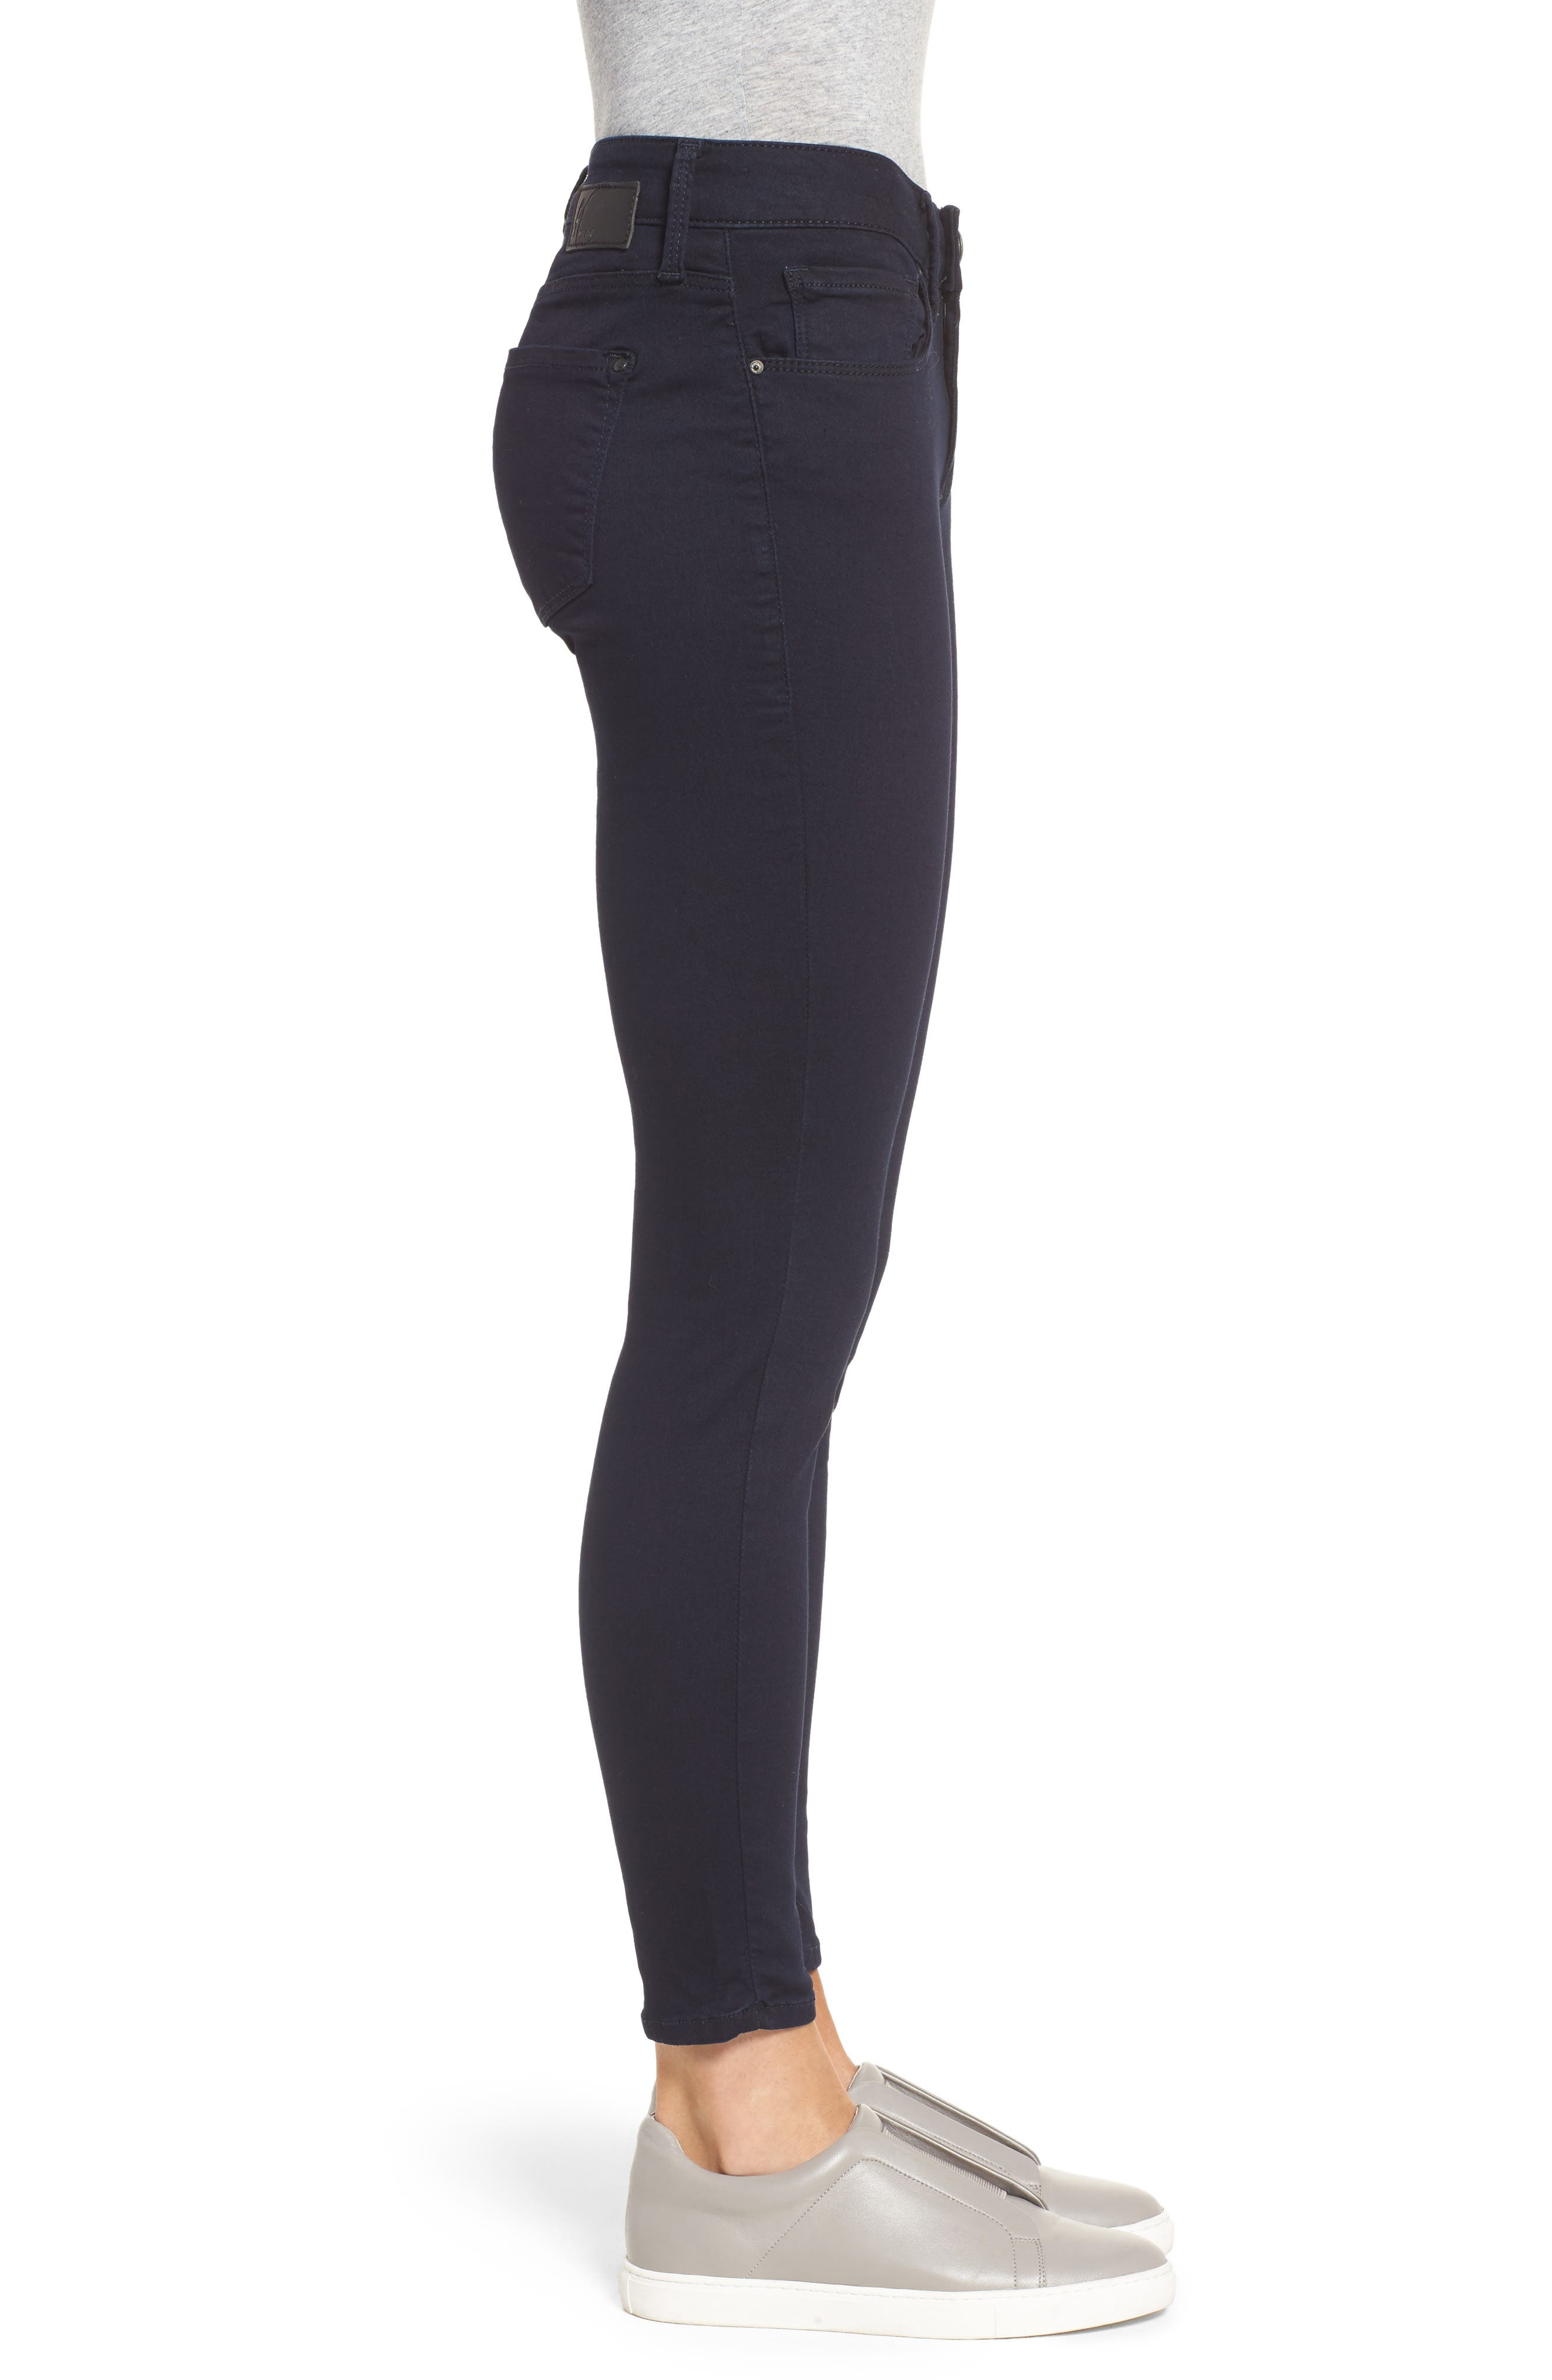 Alternate Image 3  - Mavi Jeans 'Alexa' Midrise Skinny Jeans (Dark Shanty)